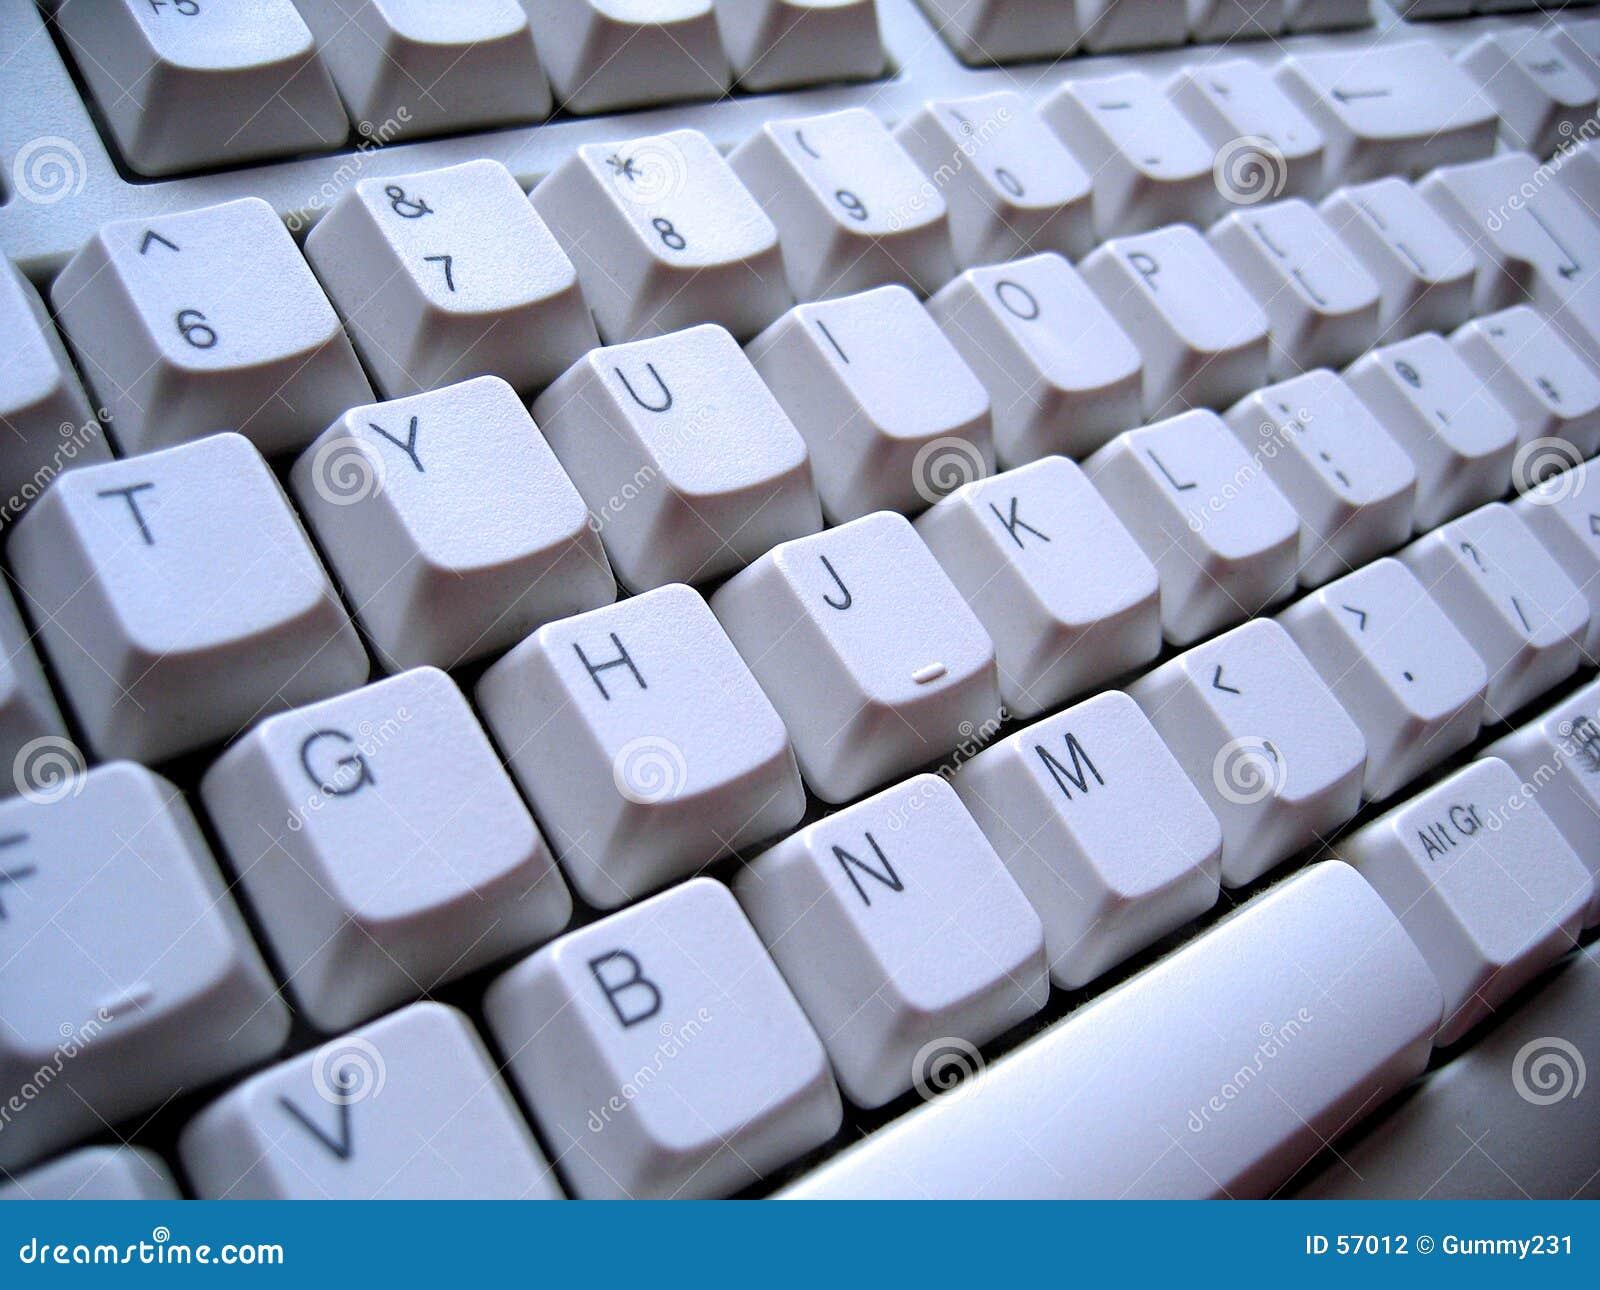 Download πληκτρολόγιο γωνίας στοκ εικόνες. εικόνα από πληκτρολόγιο - 57012